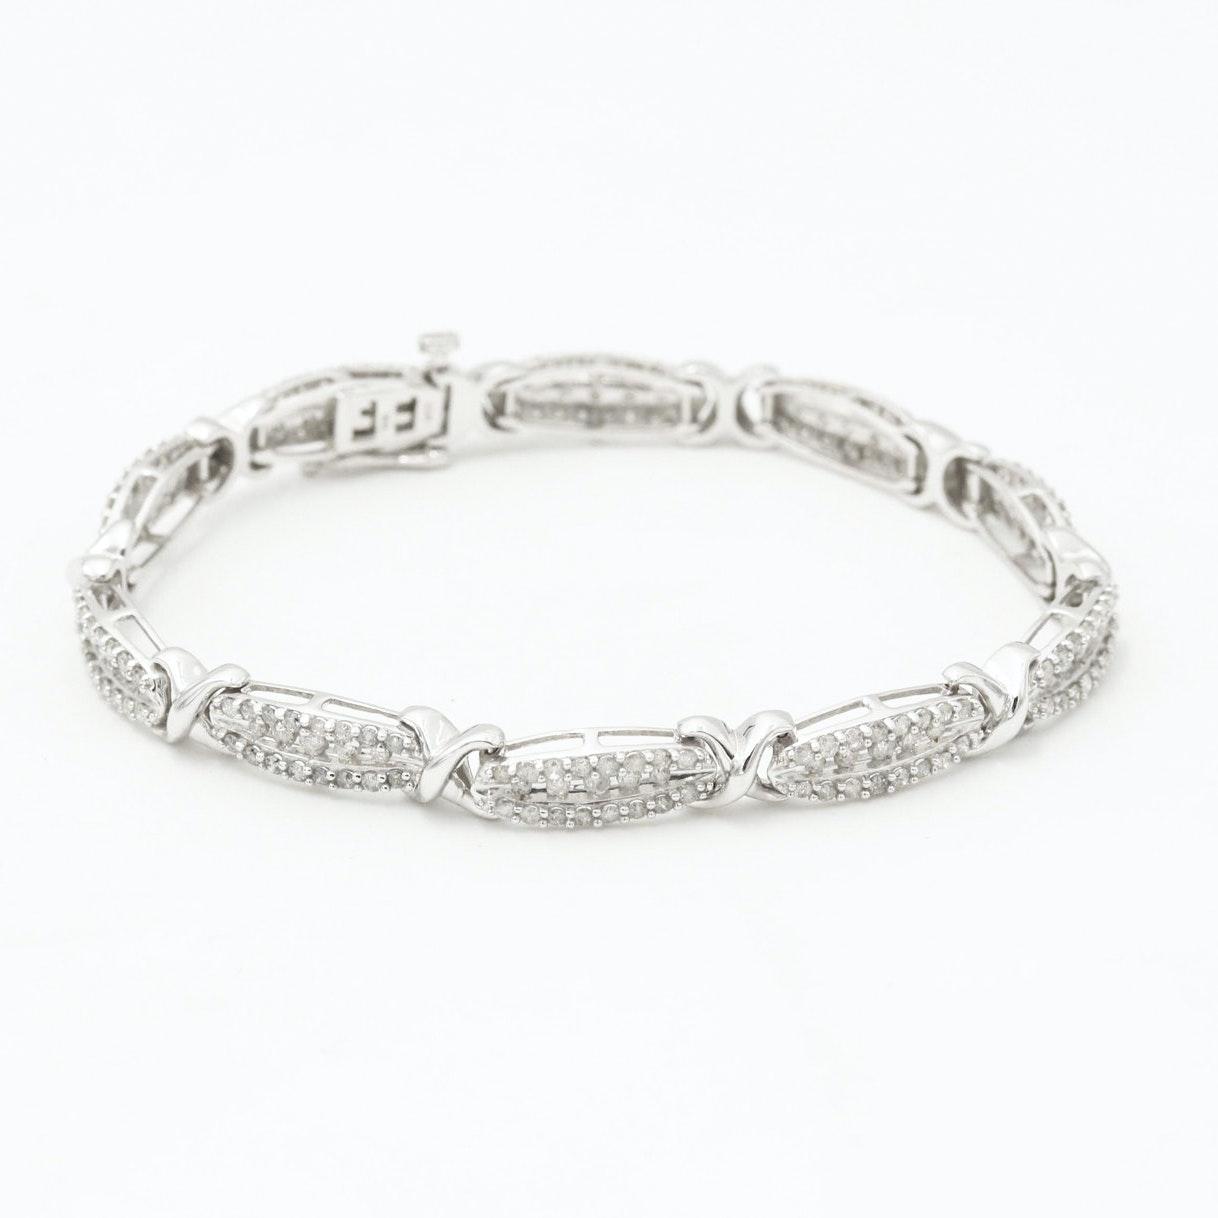 10K White Gold 3.03 CTW Diamond Bracelet